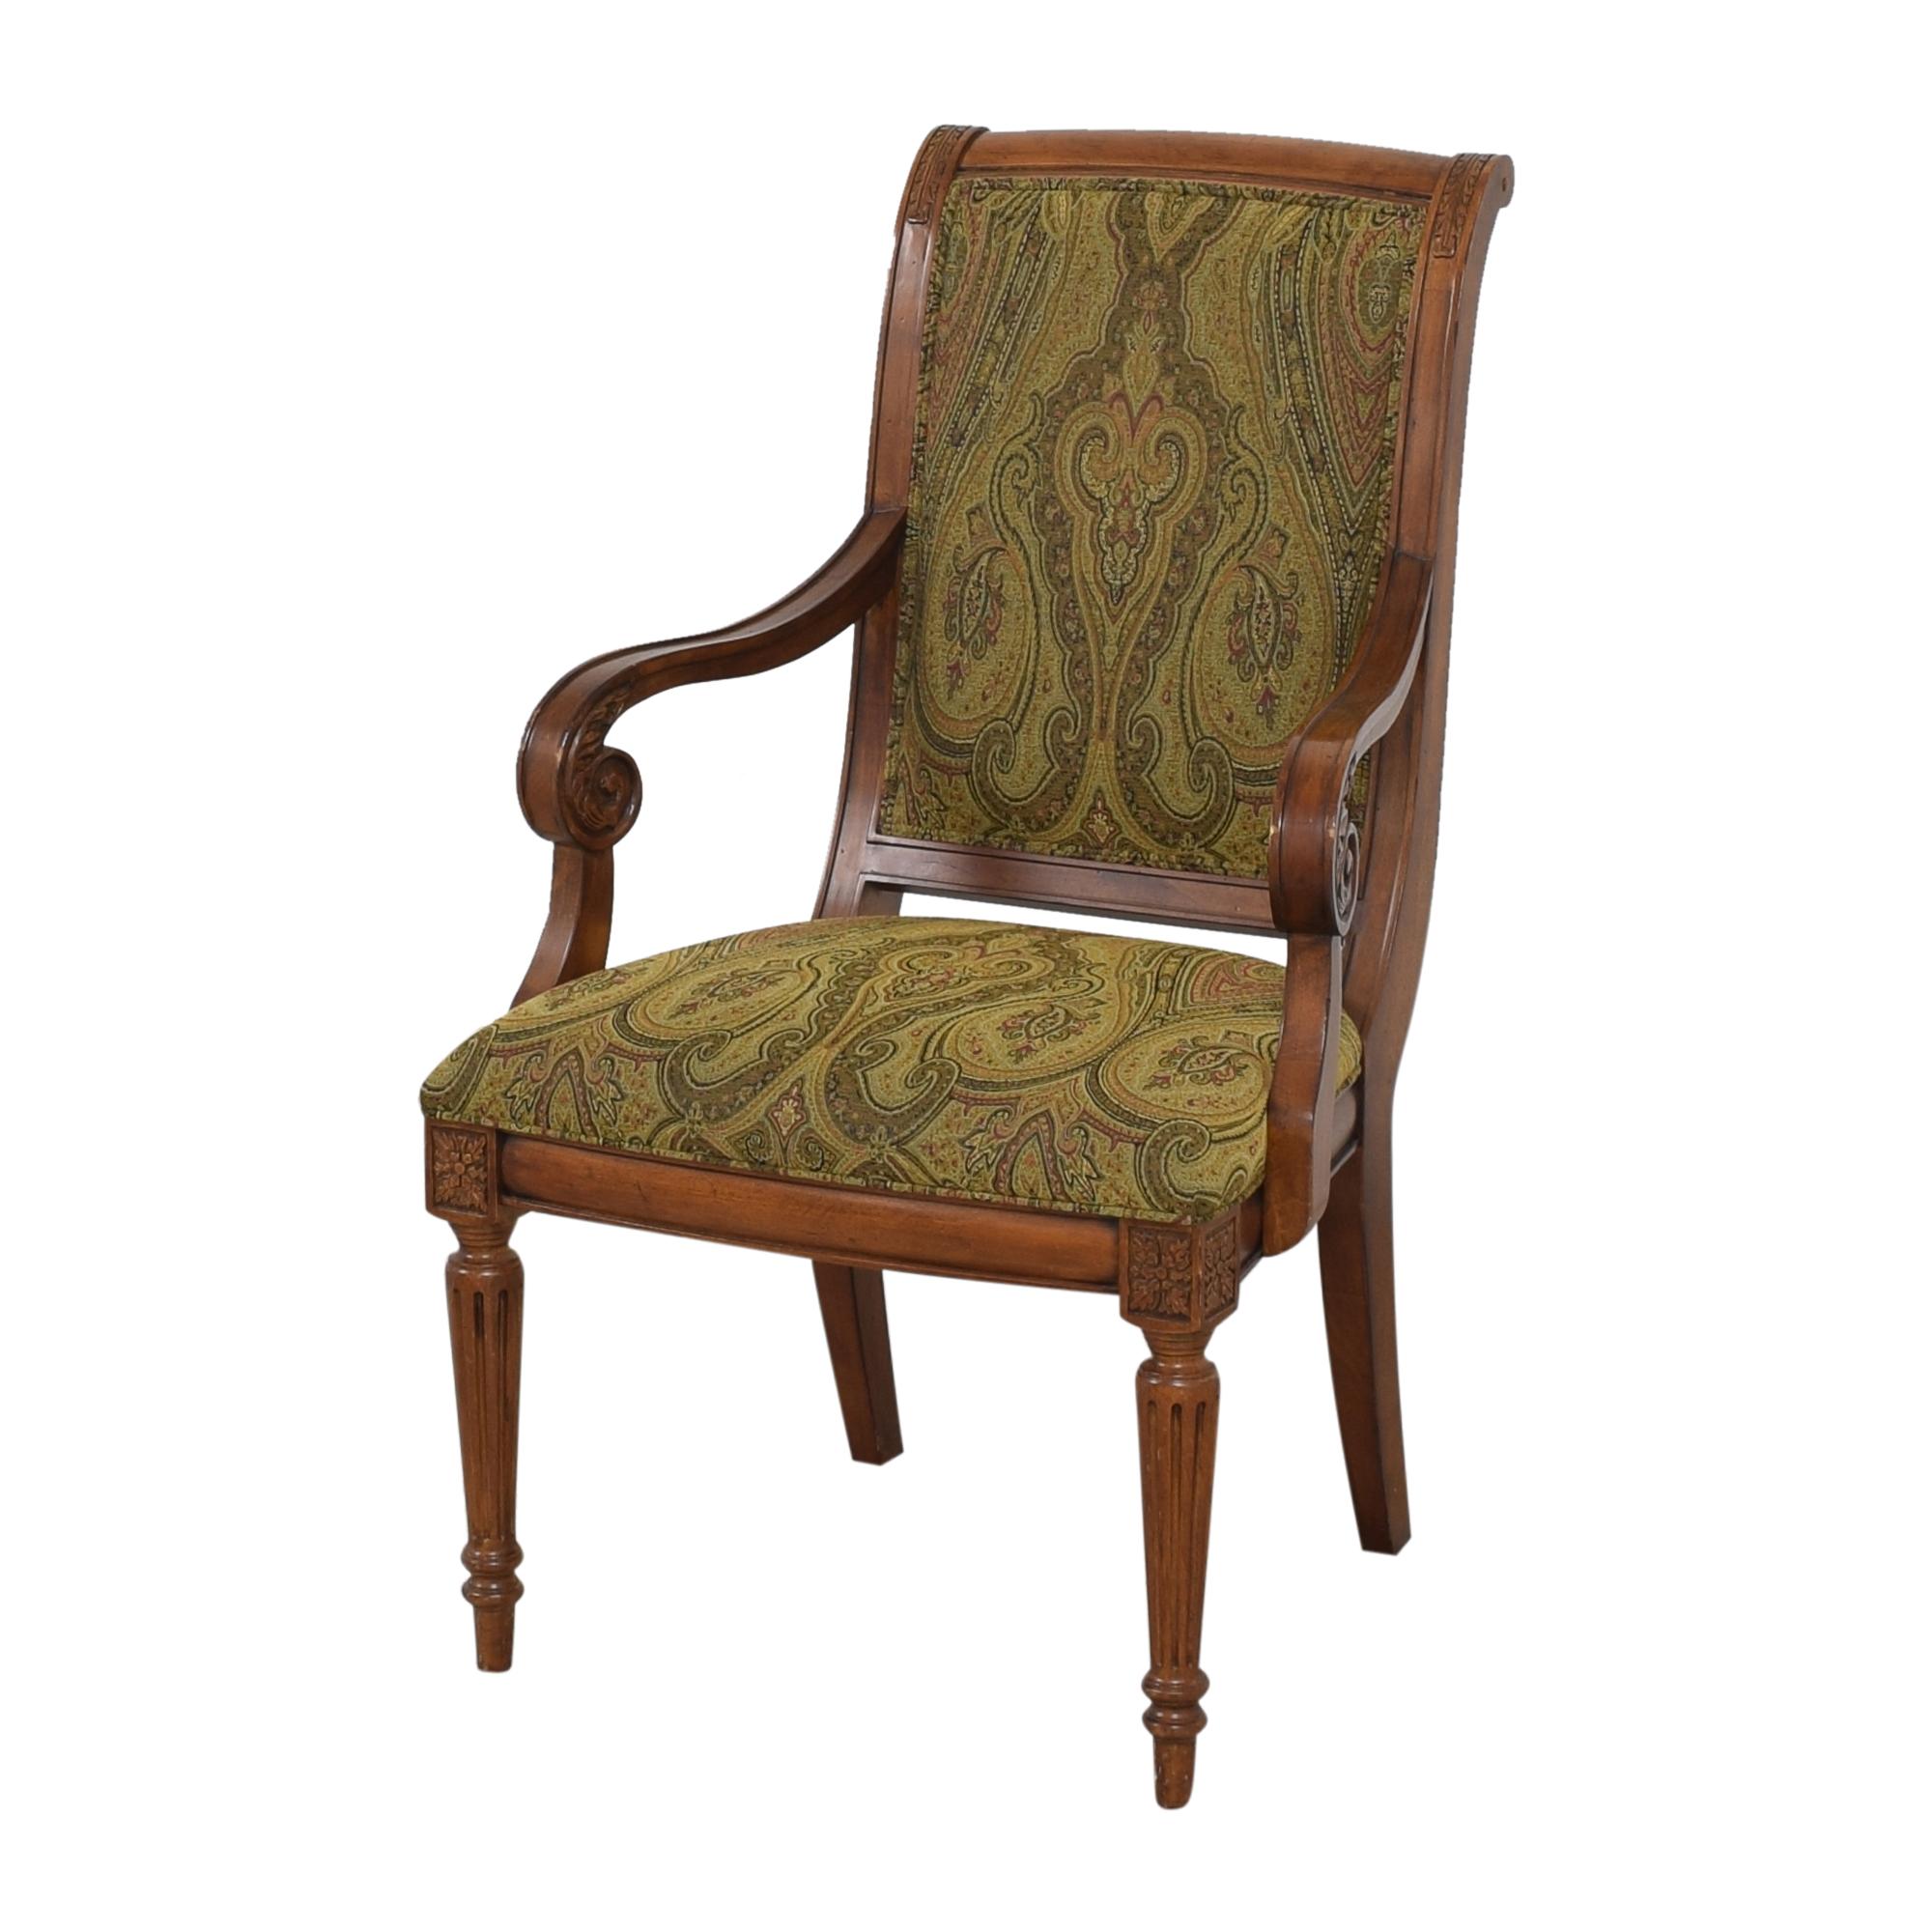 shop Ethan Allen Ethan Allen Adison Dining Arm Chairs online